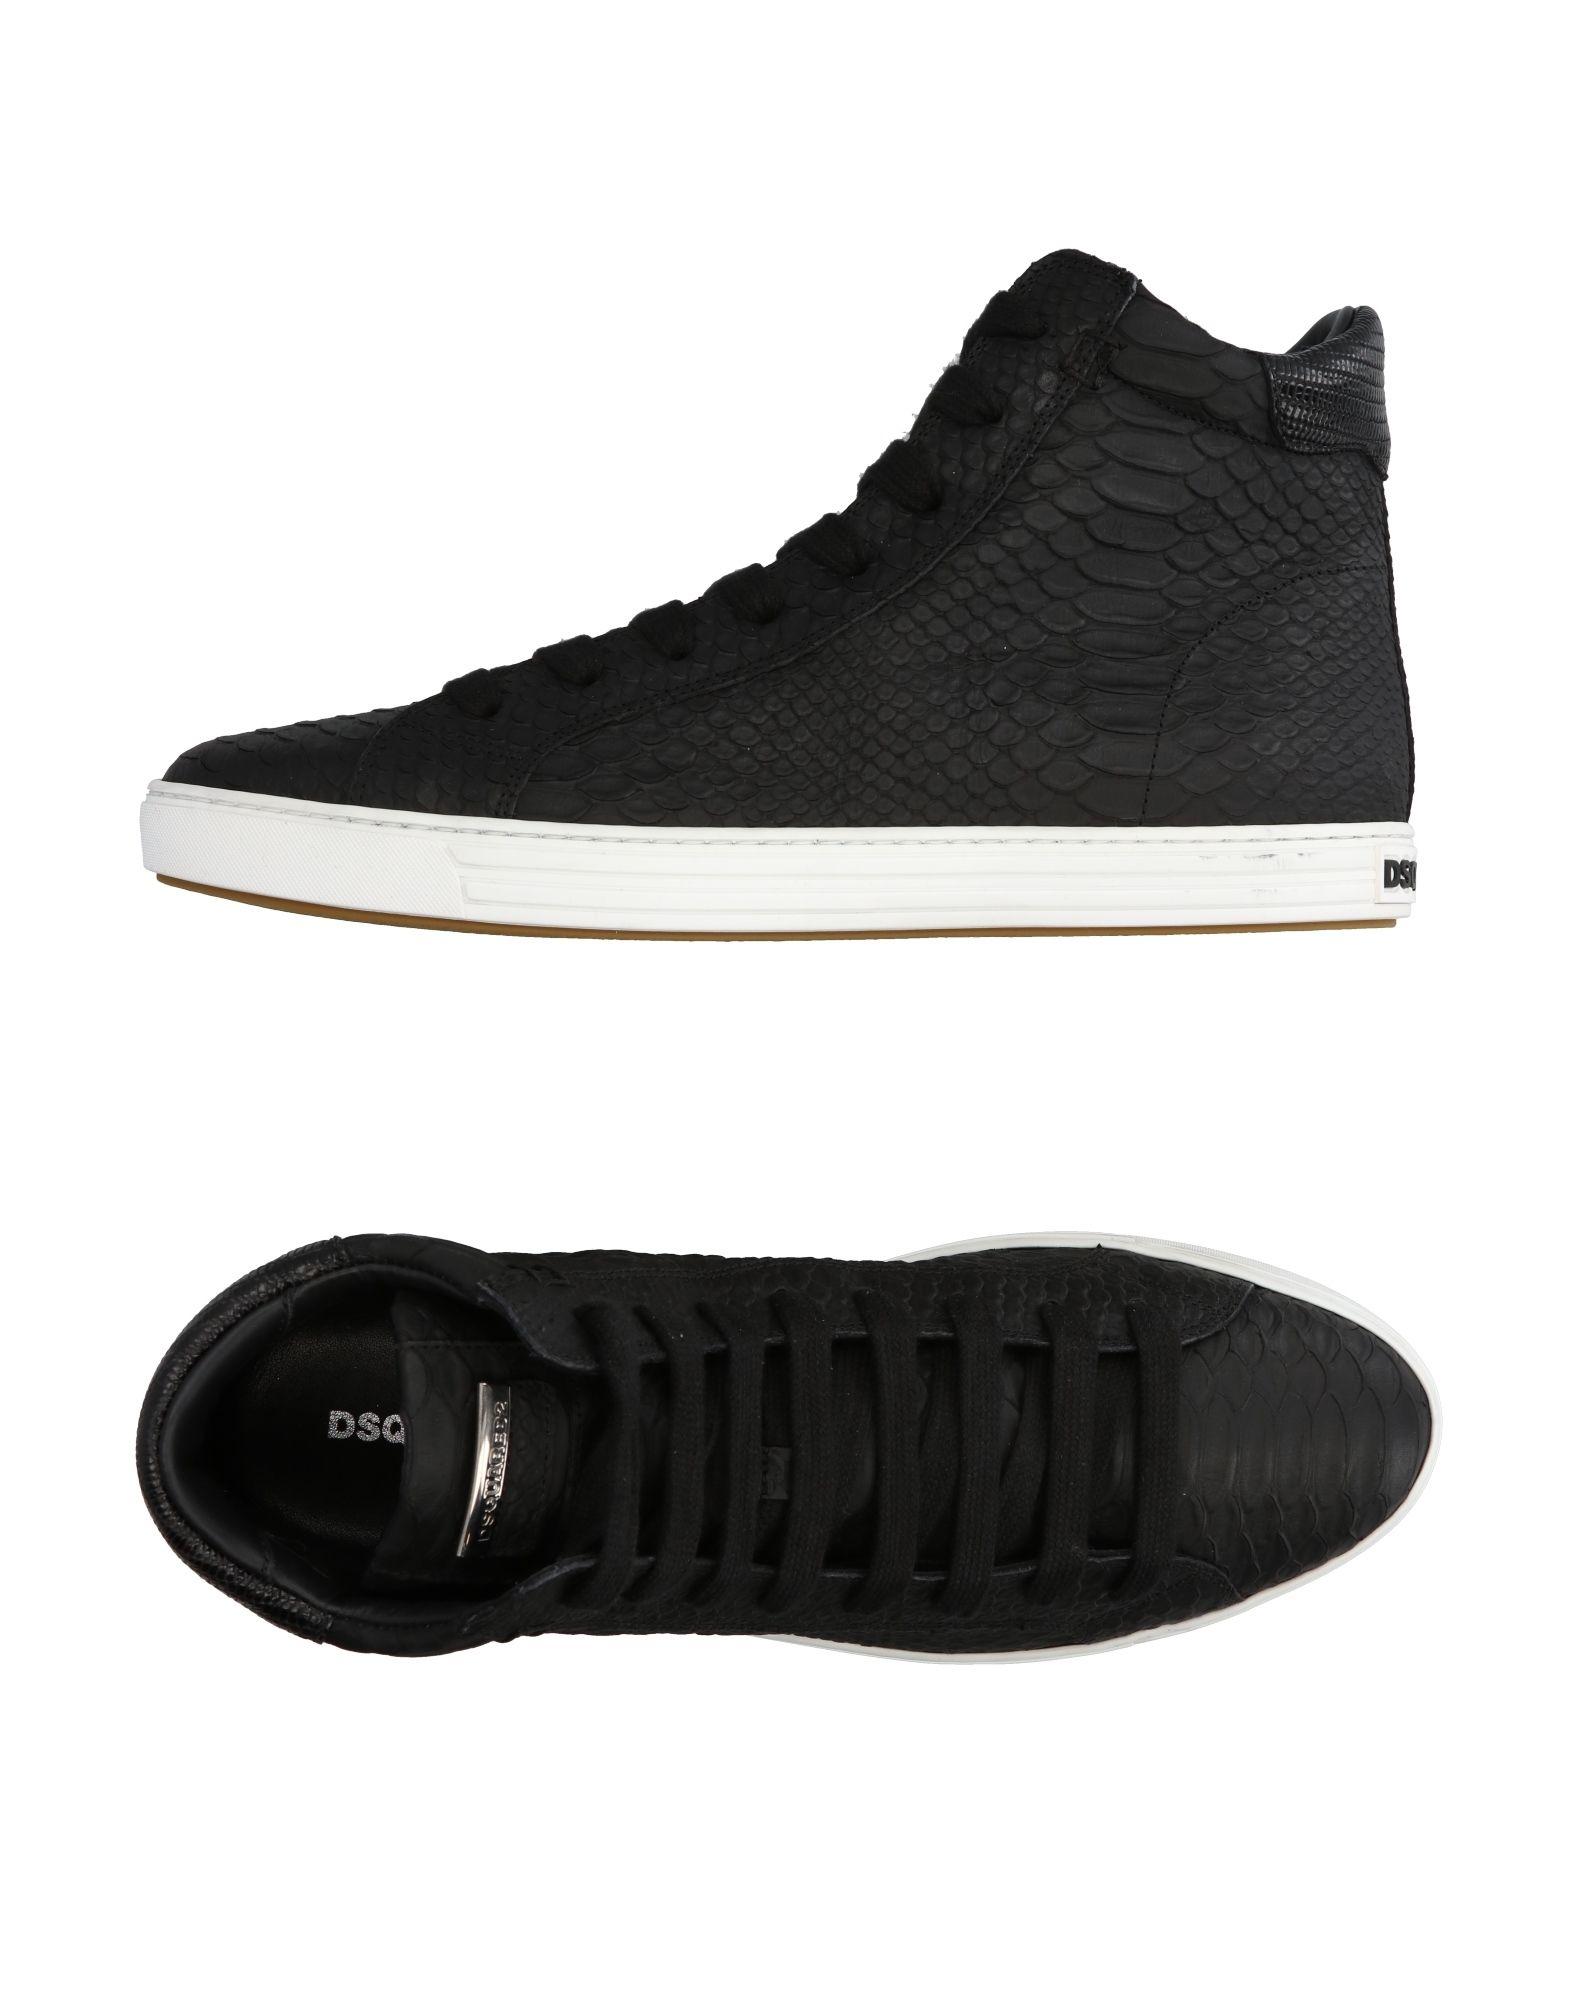 DsquaROT2 es Sneakers Herren Gutes Preis-Leistungs-Verhältnis, es DsquaROT2 lohnt sich 7790 742cf7